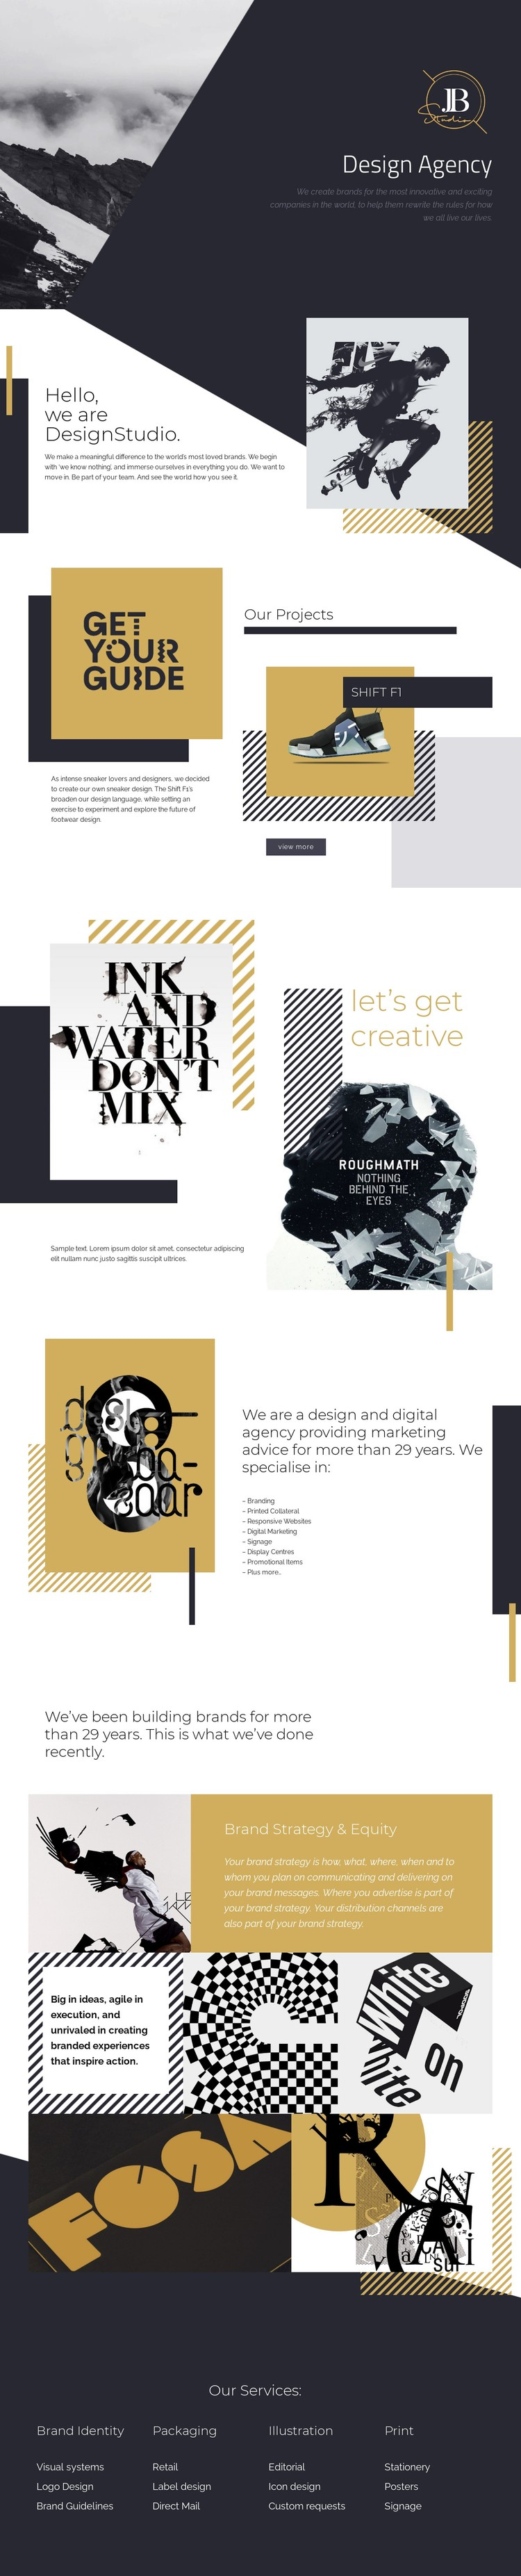 We create amazing websites Website Creator